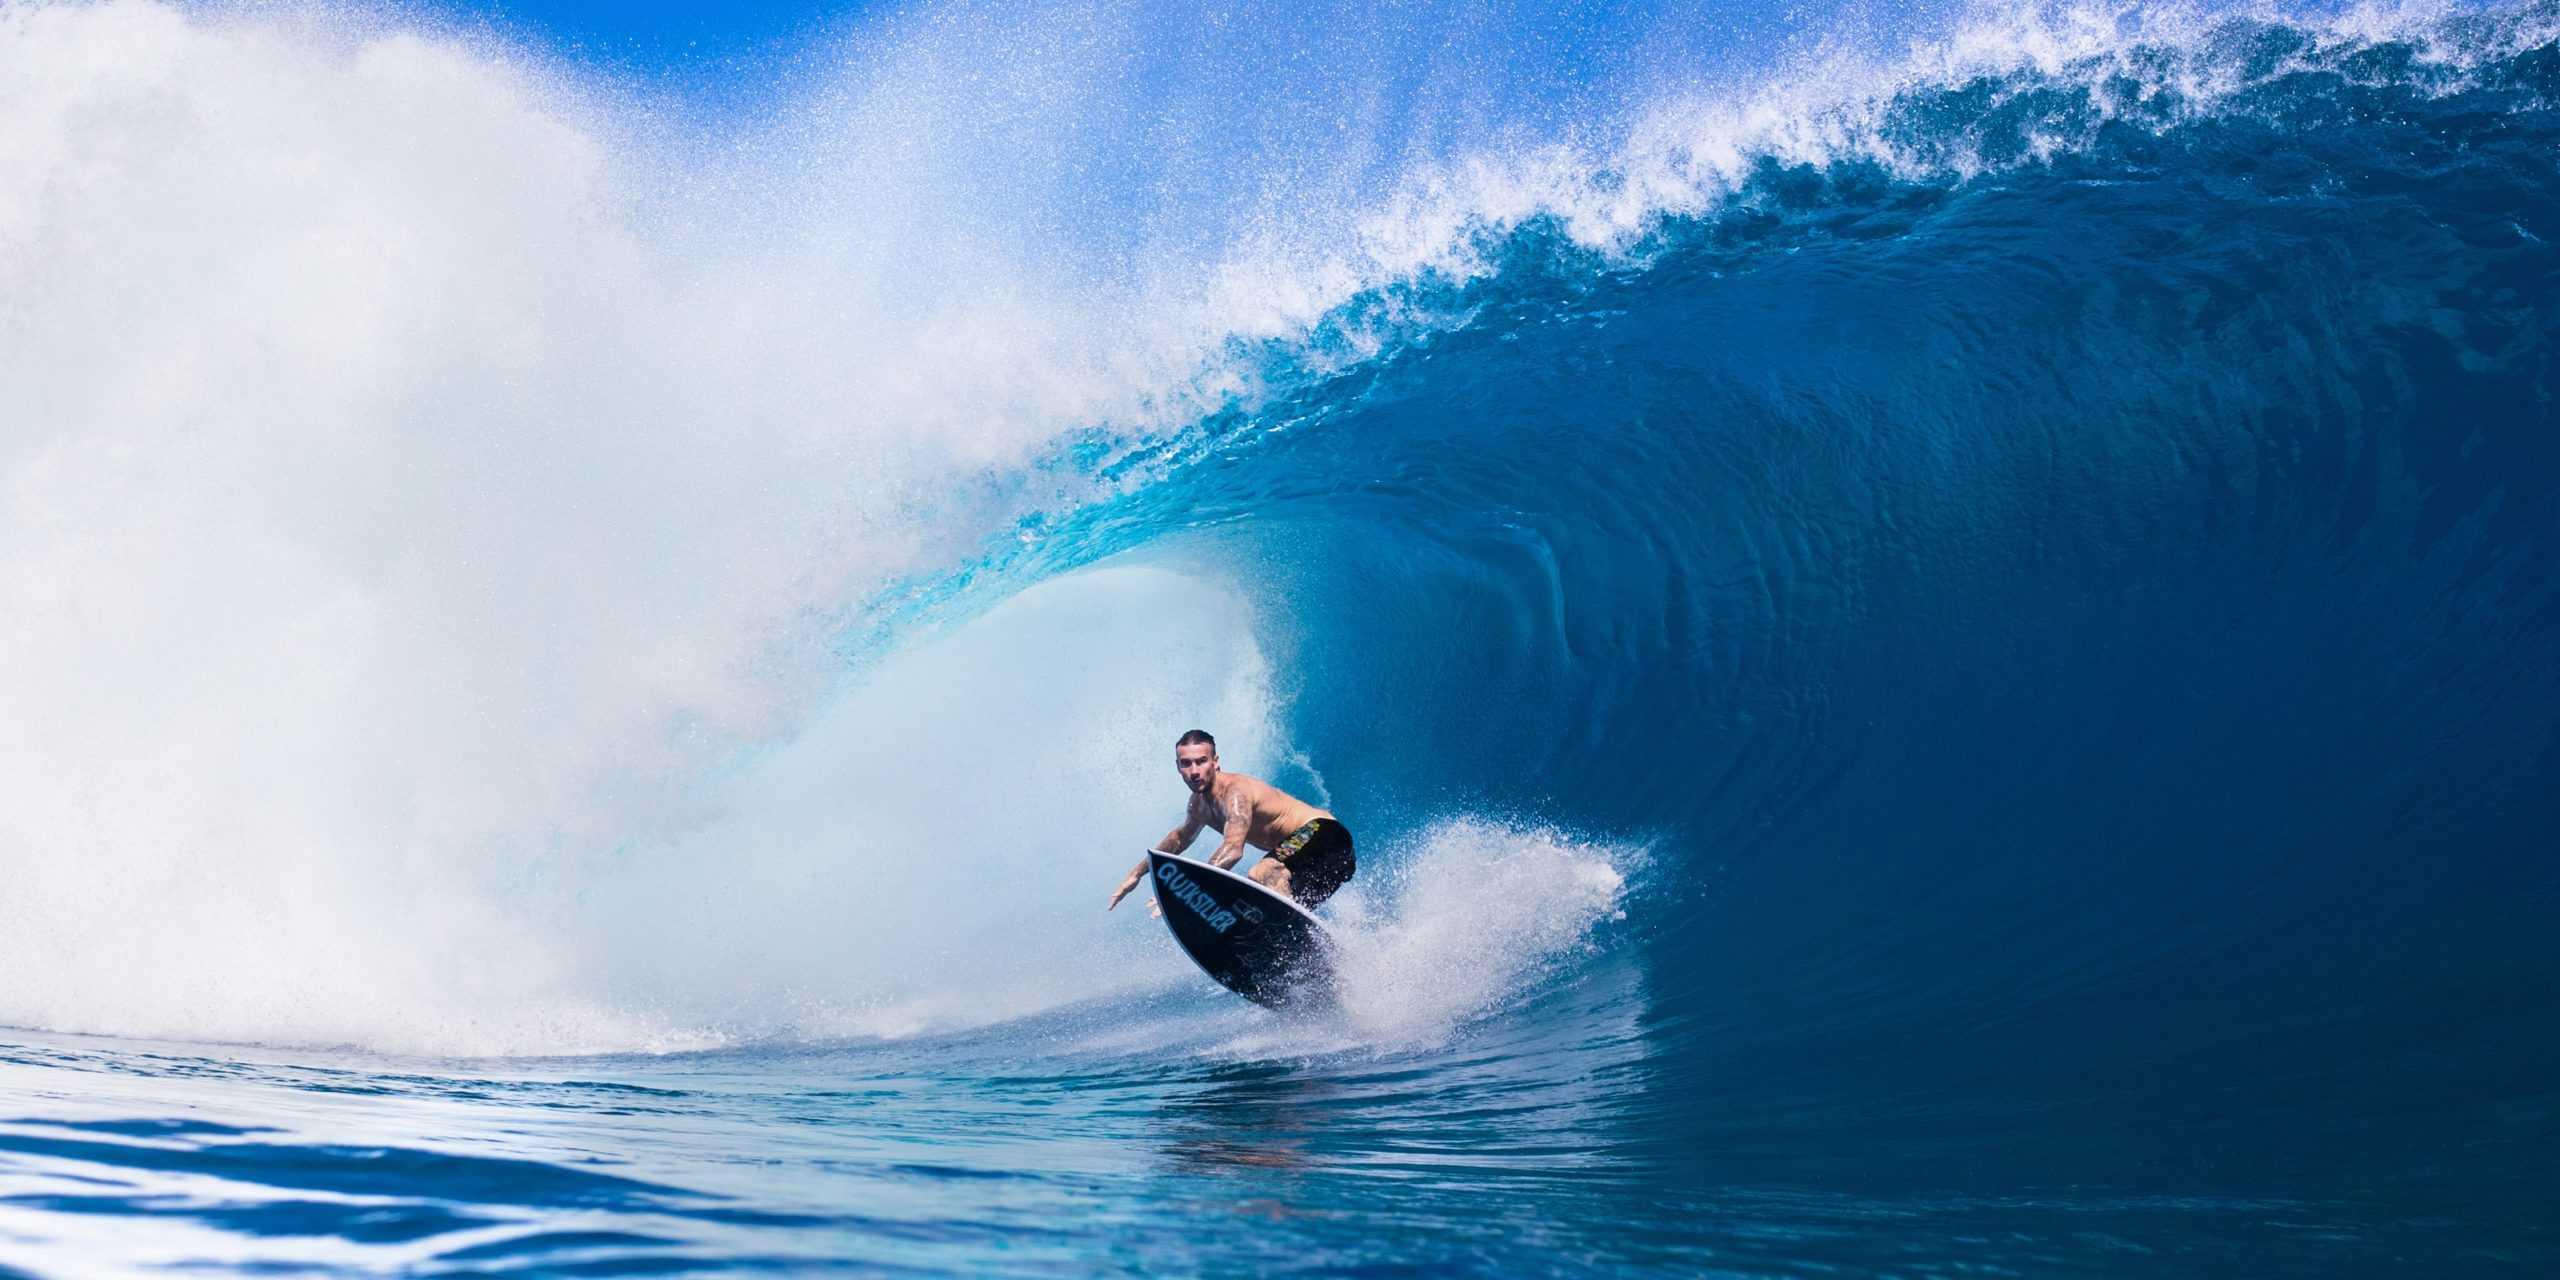 Quiksilver surfing